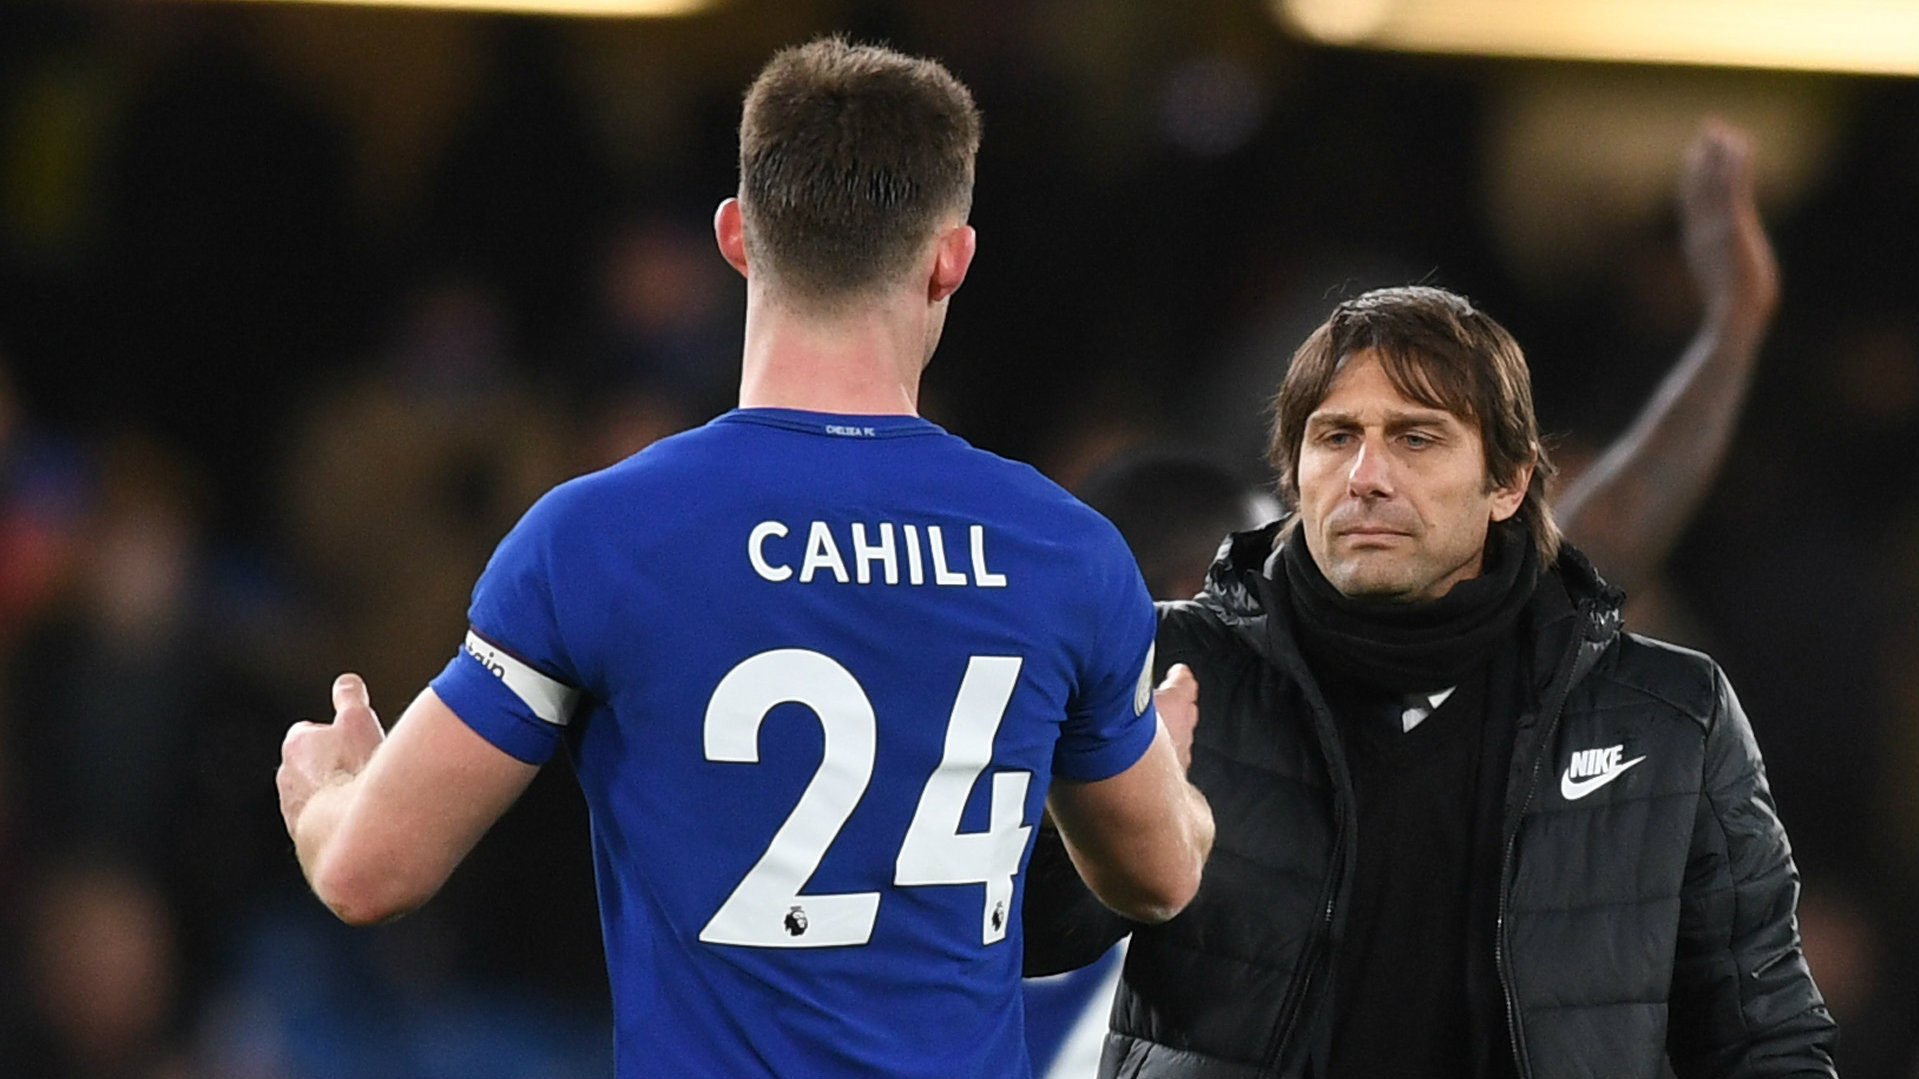 Gary Cahill, Antonio Conte, Chelsea, 17/18